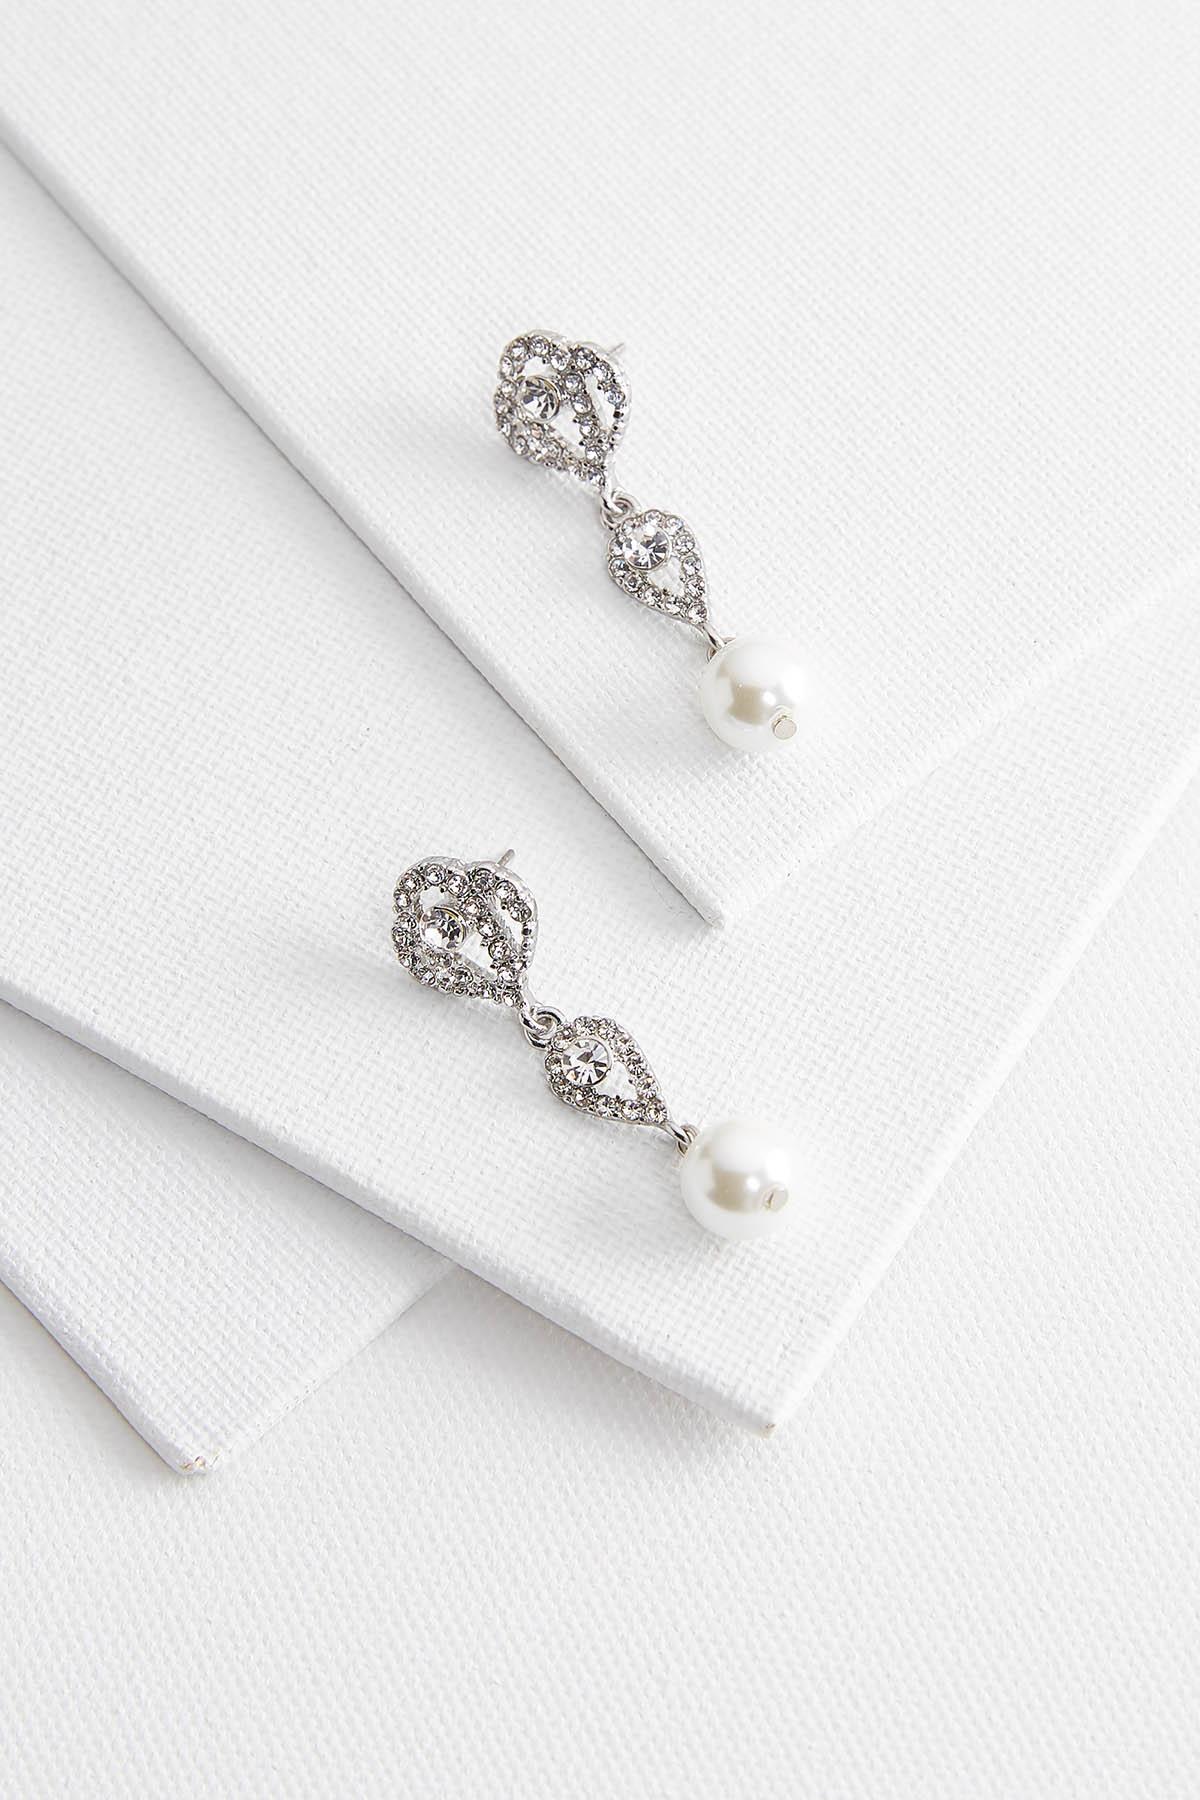 Dangling Deco Pearl Earrings